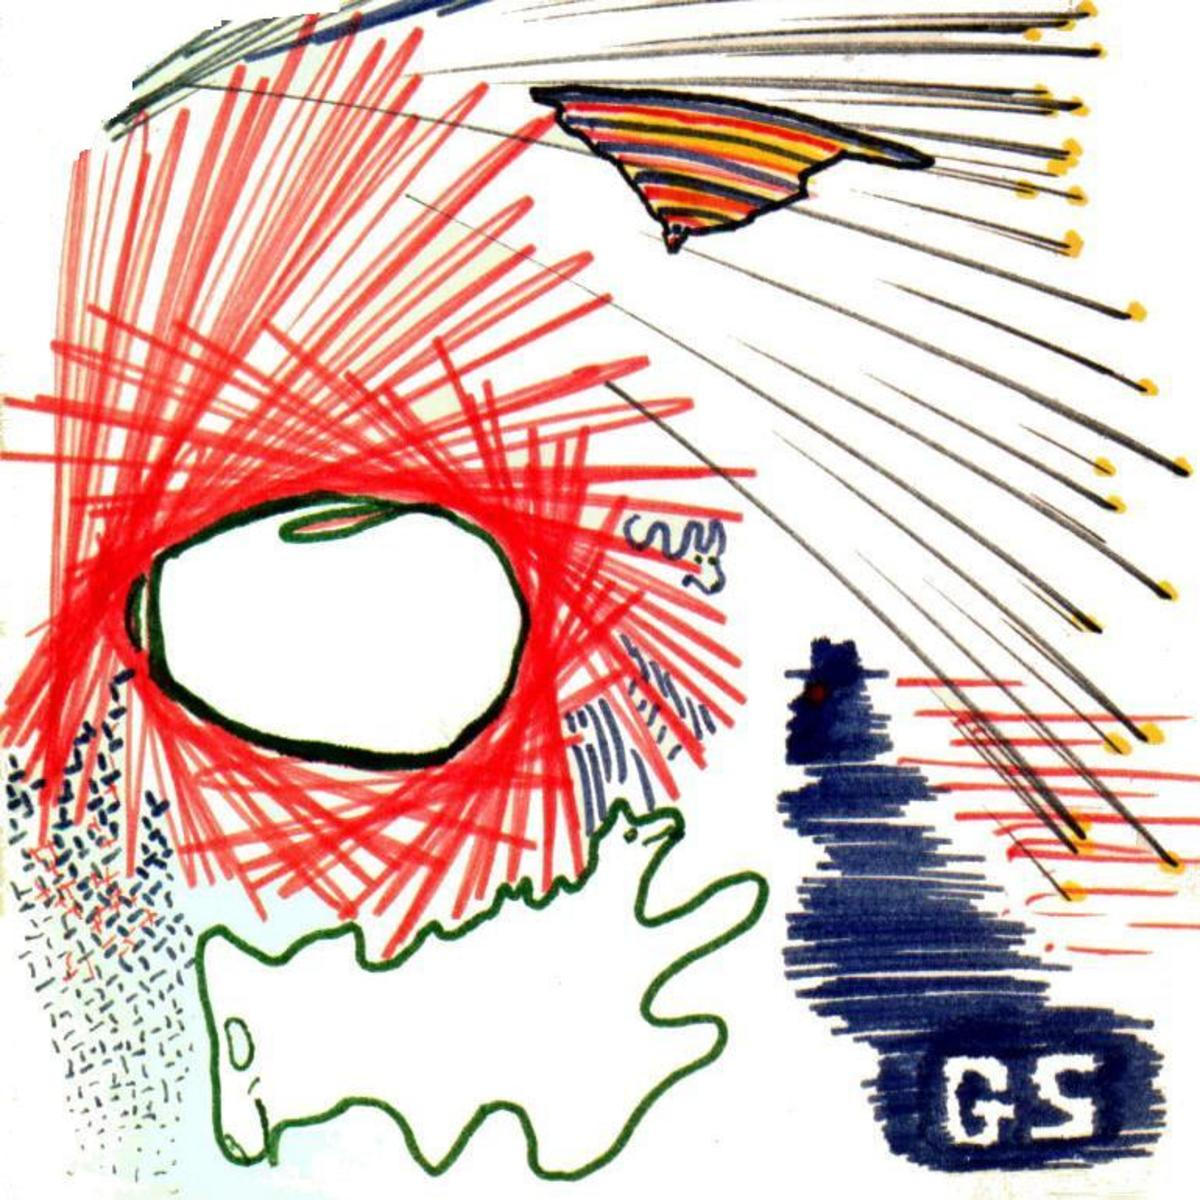 The unconscious mind can communicate through doodles.